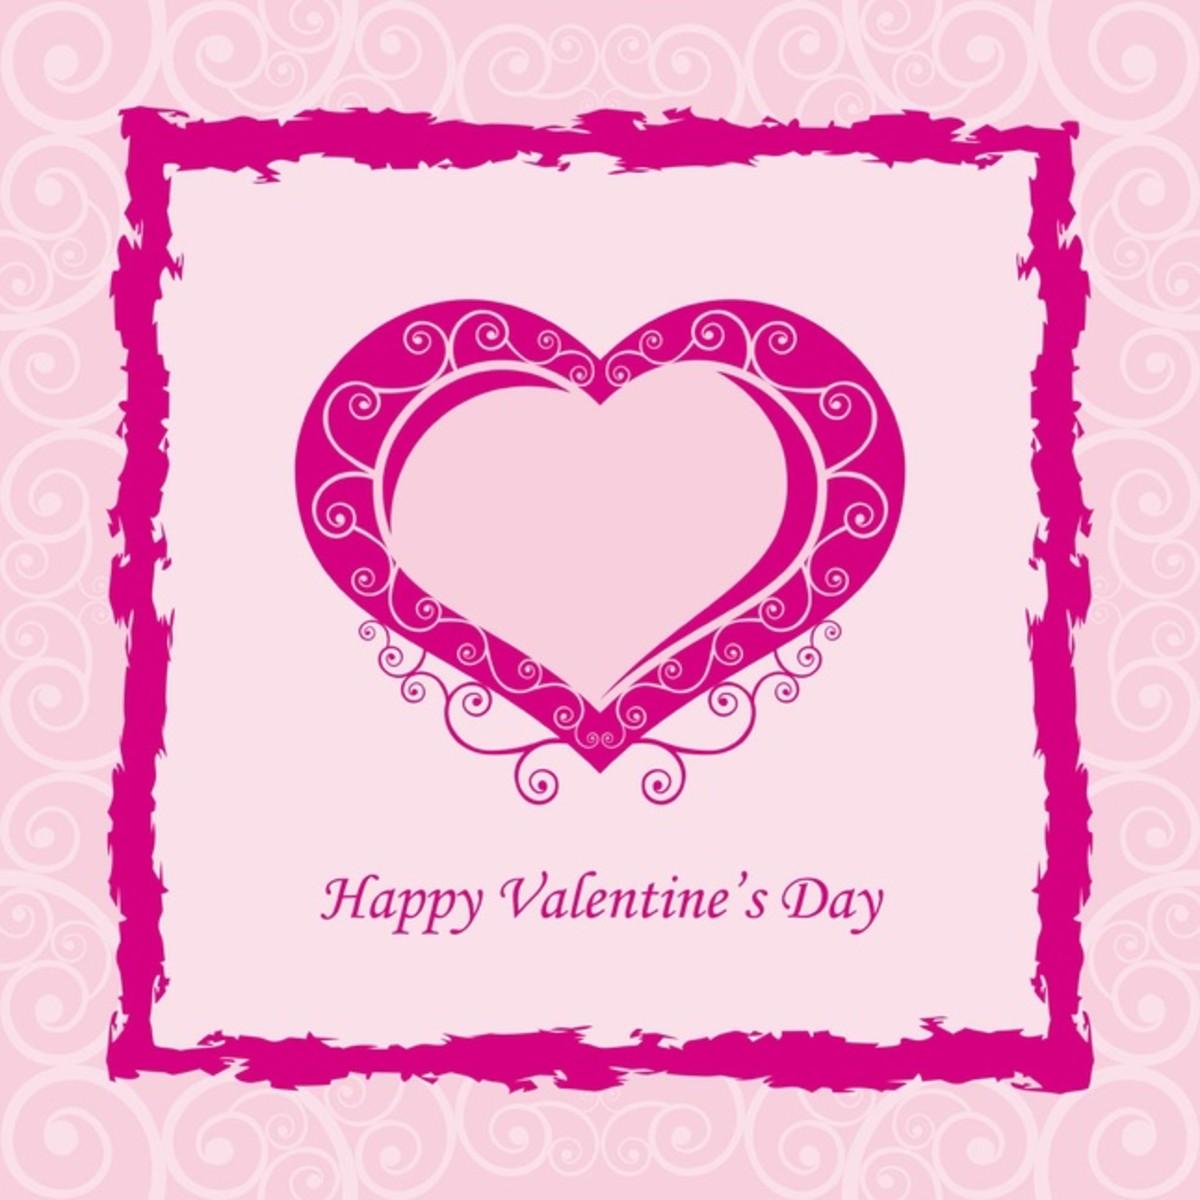 Hot Pink Happy Valentine's Day Image